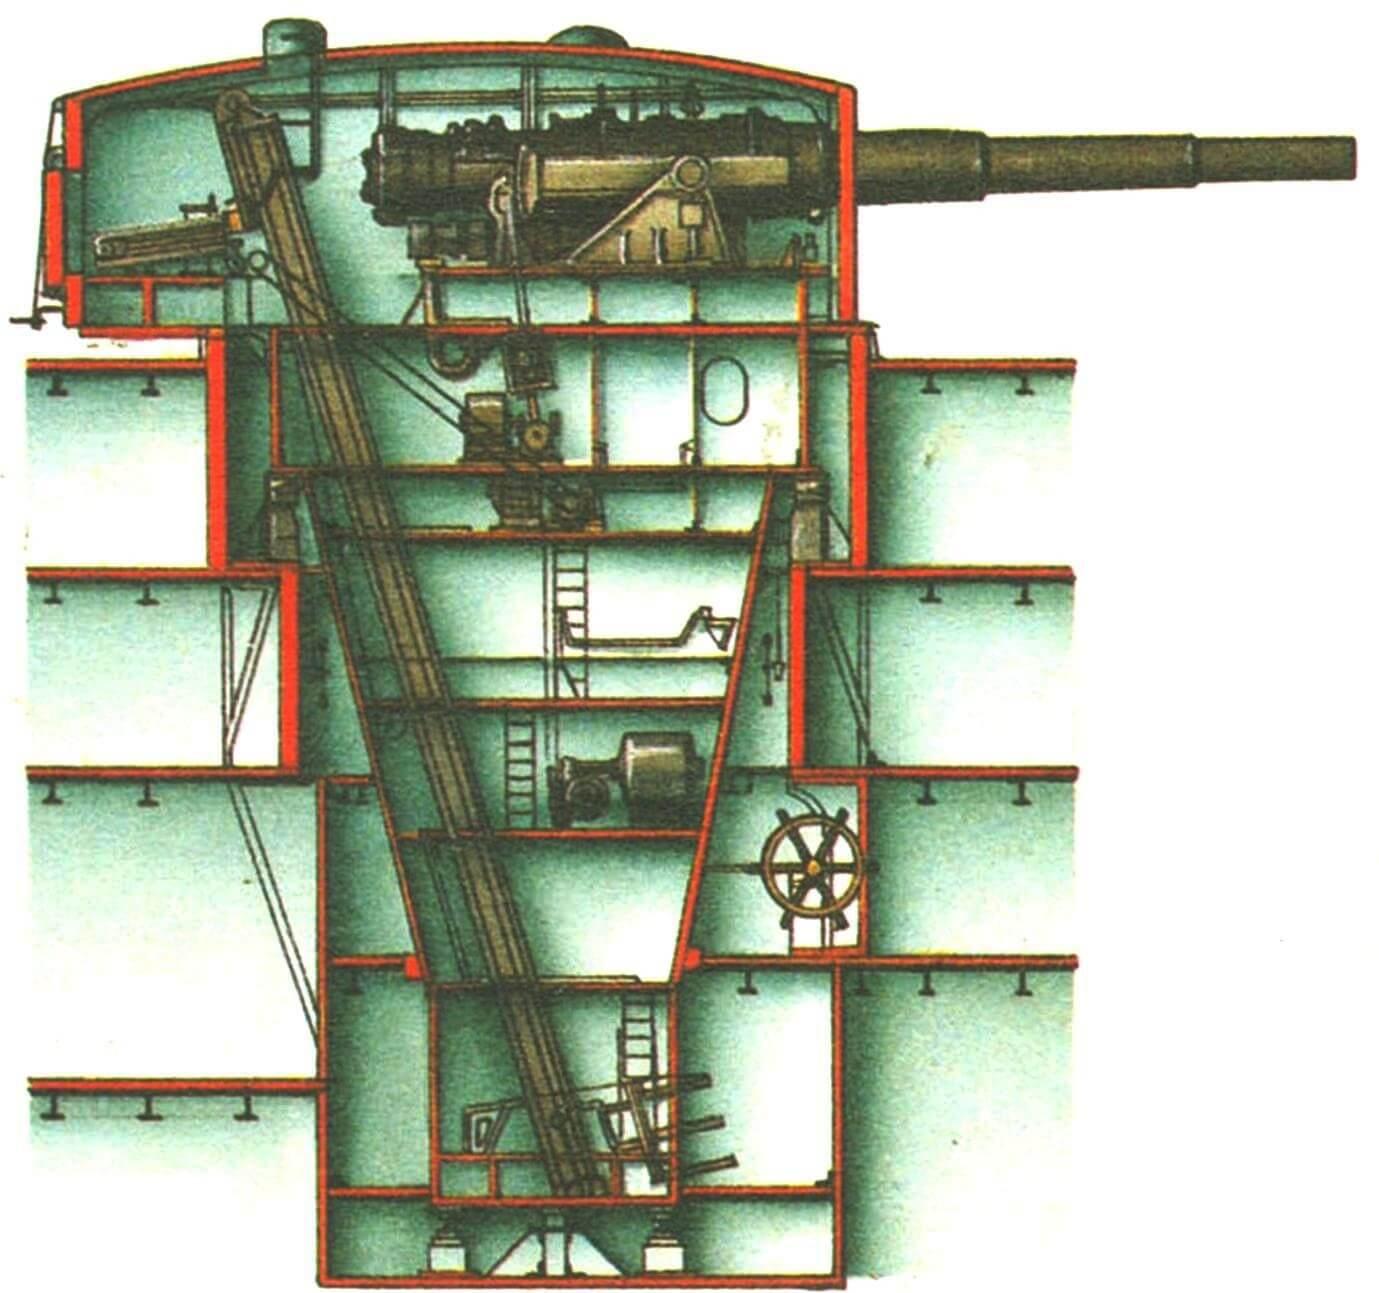 Башня броненосца «Ретвизан» (Россия, 1902 г.).